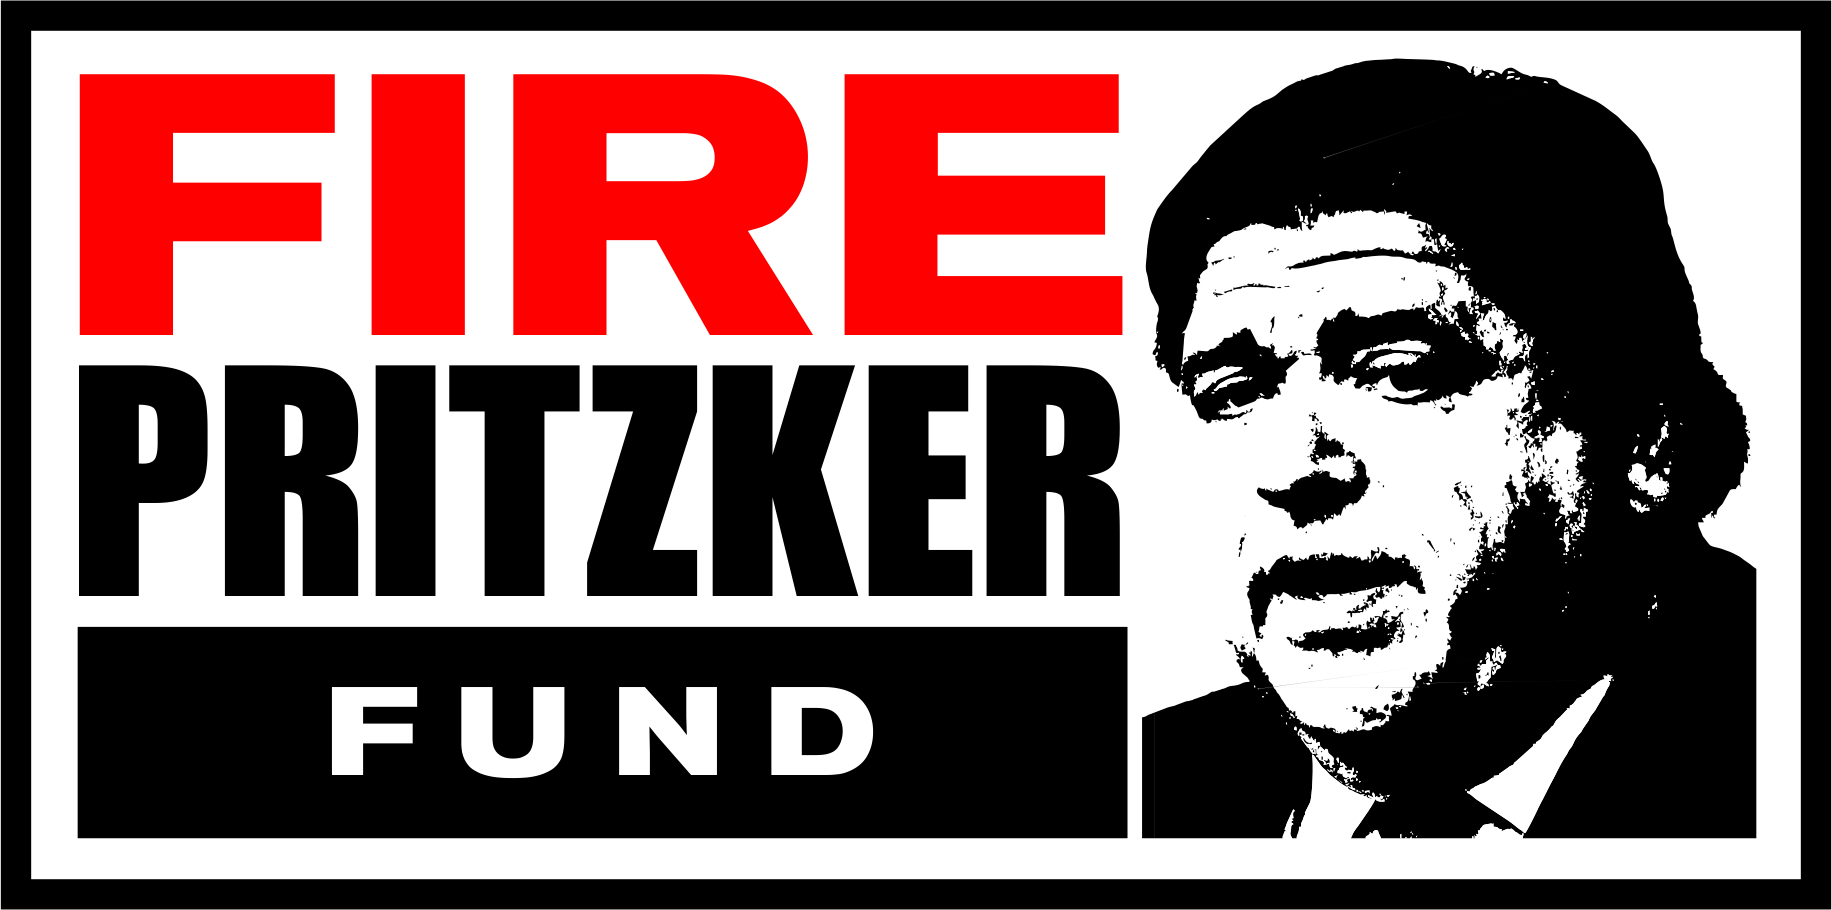 Fire pritzker fund winred